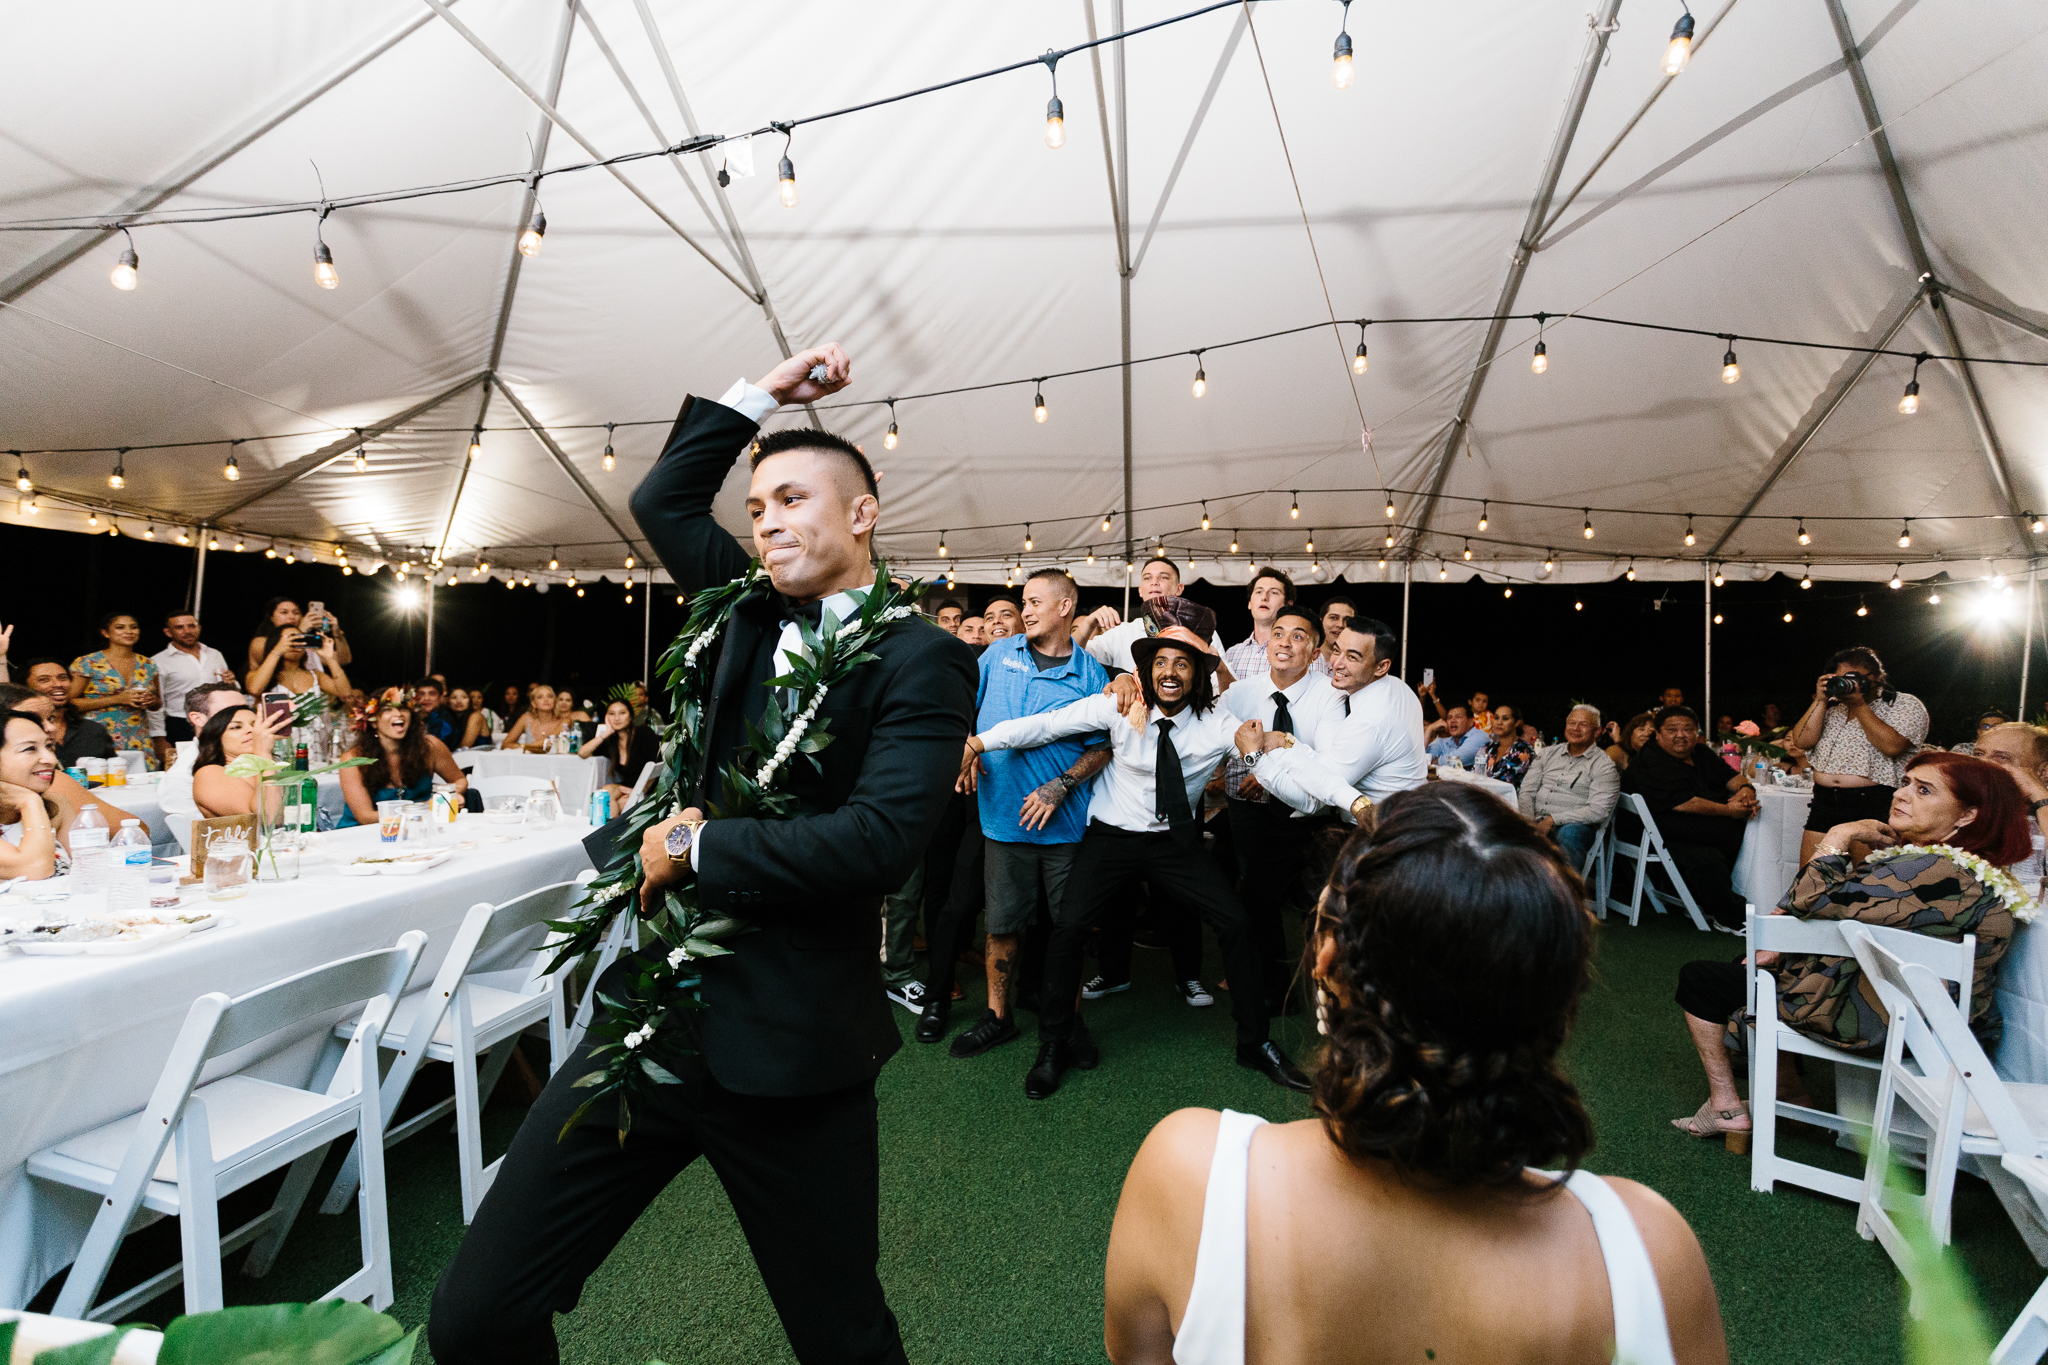 Kualoa_Ranch_Wedding_Photographer_Tone_Hawaii-57.jpg